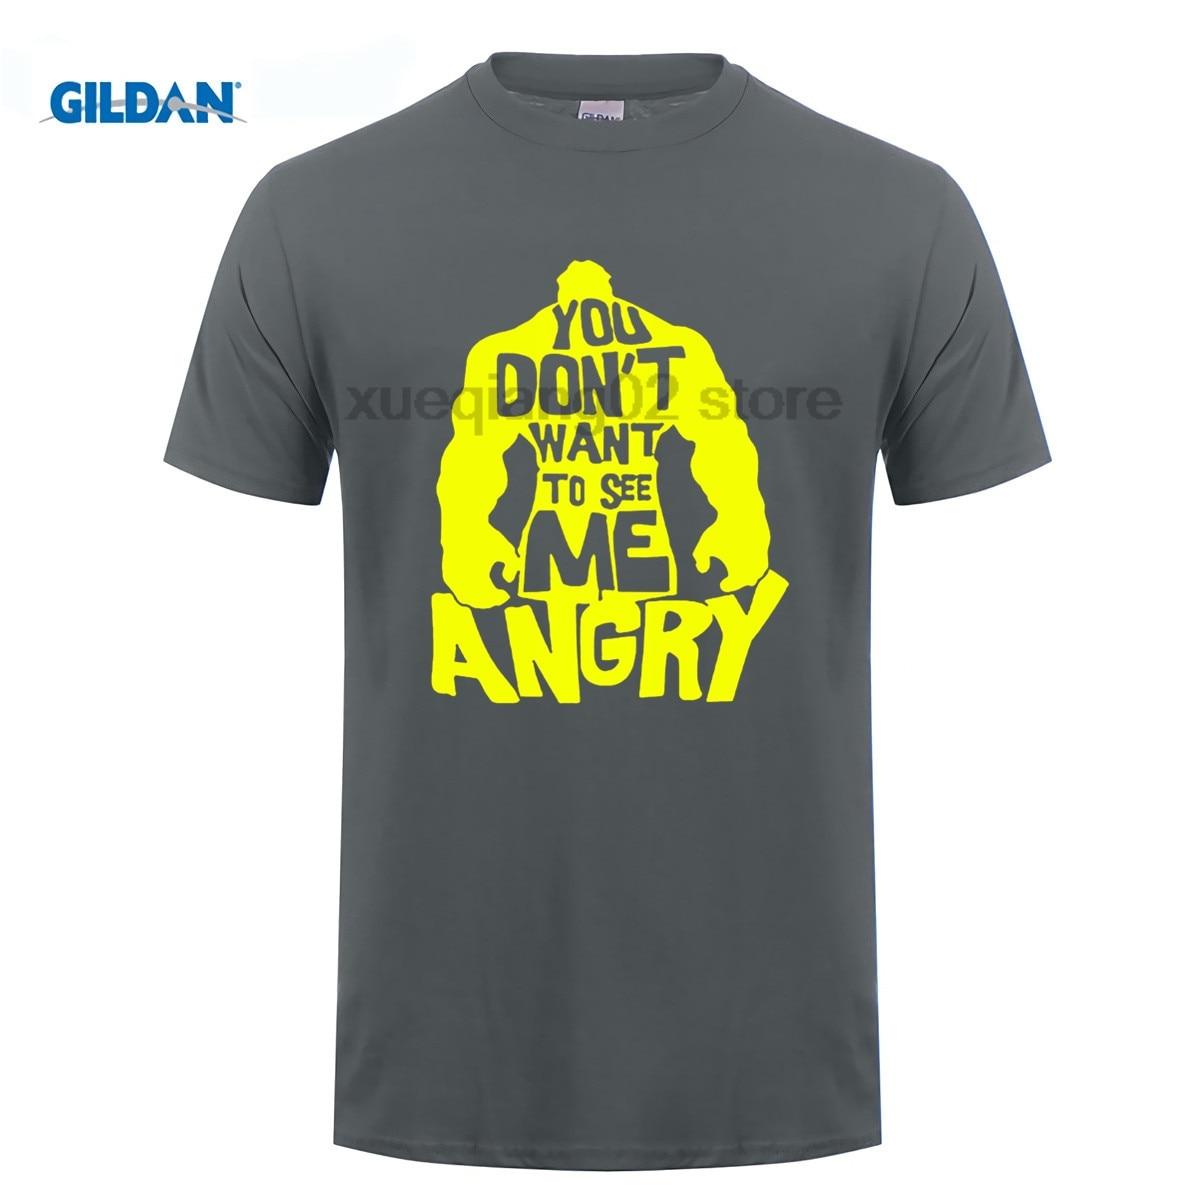 GILDAN Nieuwe Hulk T-shirts Mannen U niet wilt zie me angry T-shirt O hals Korte